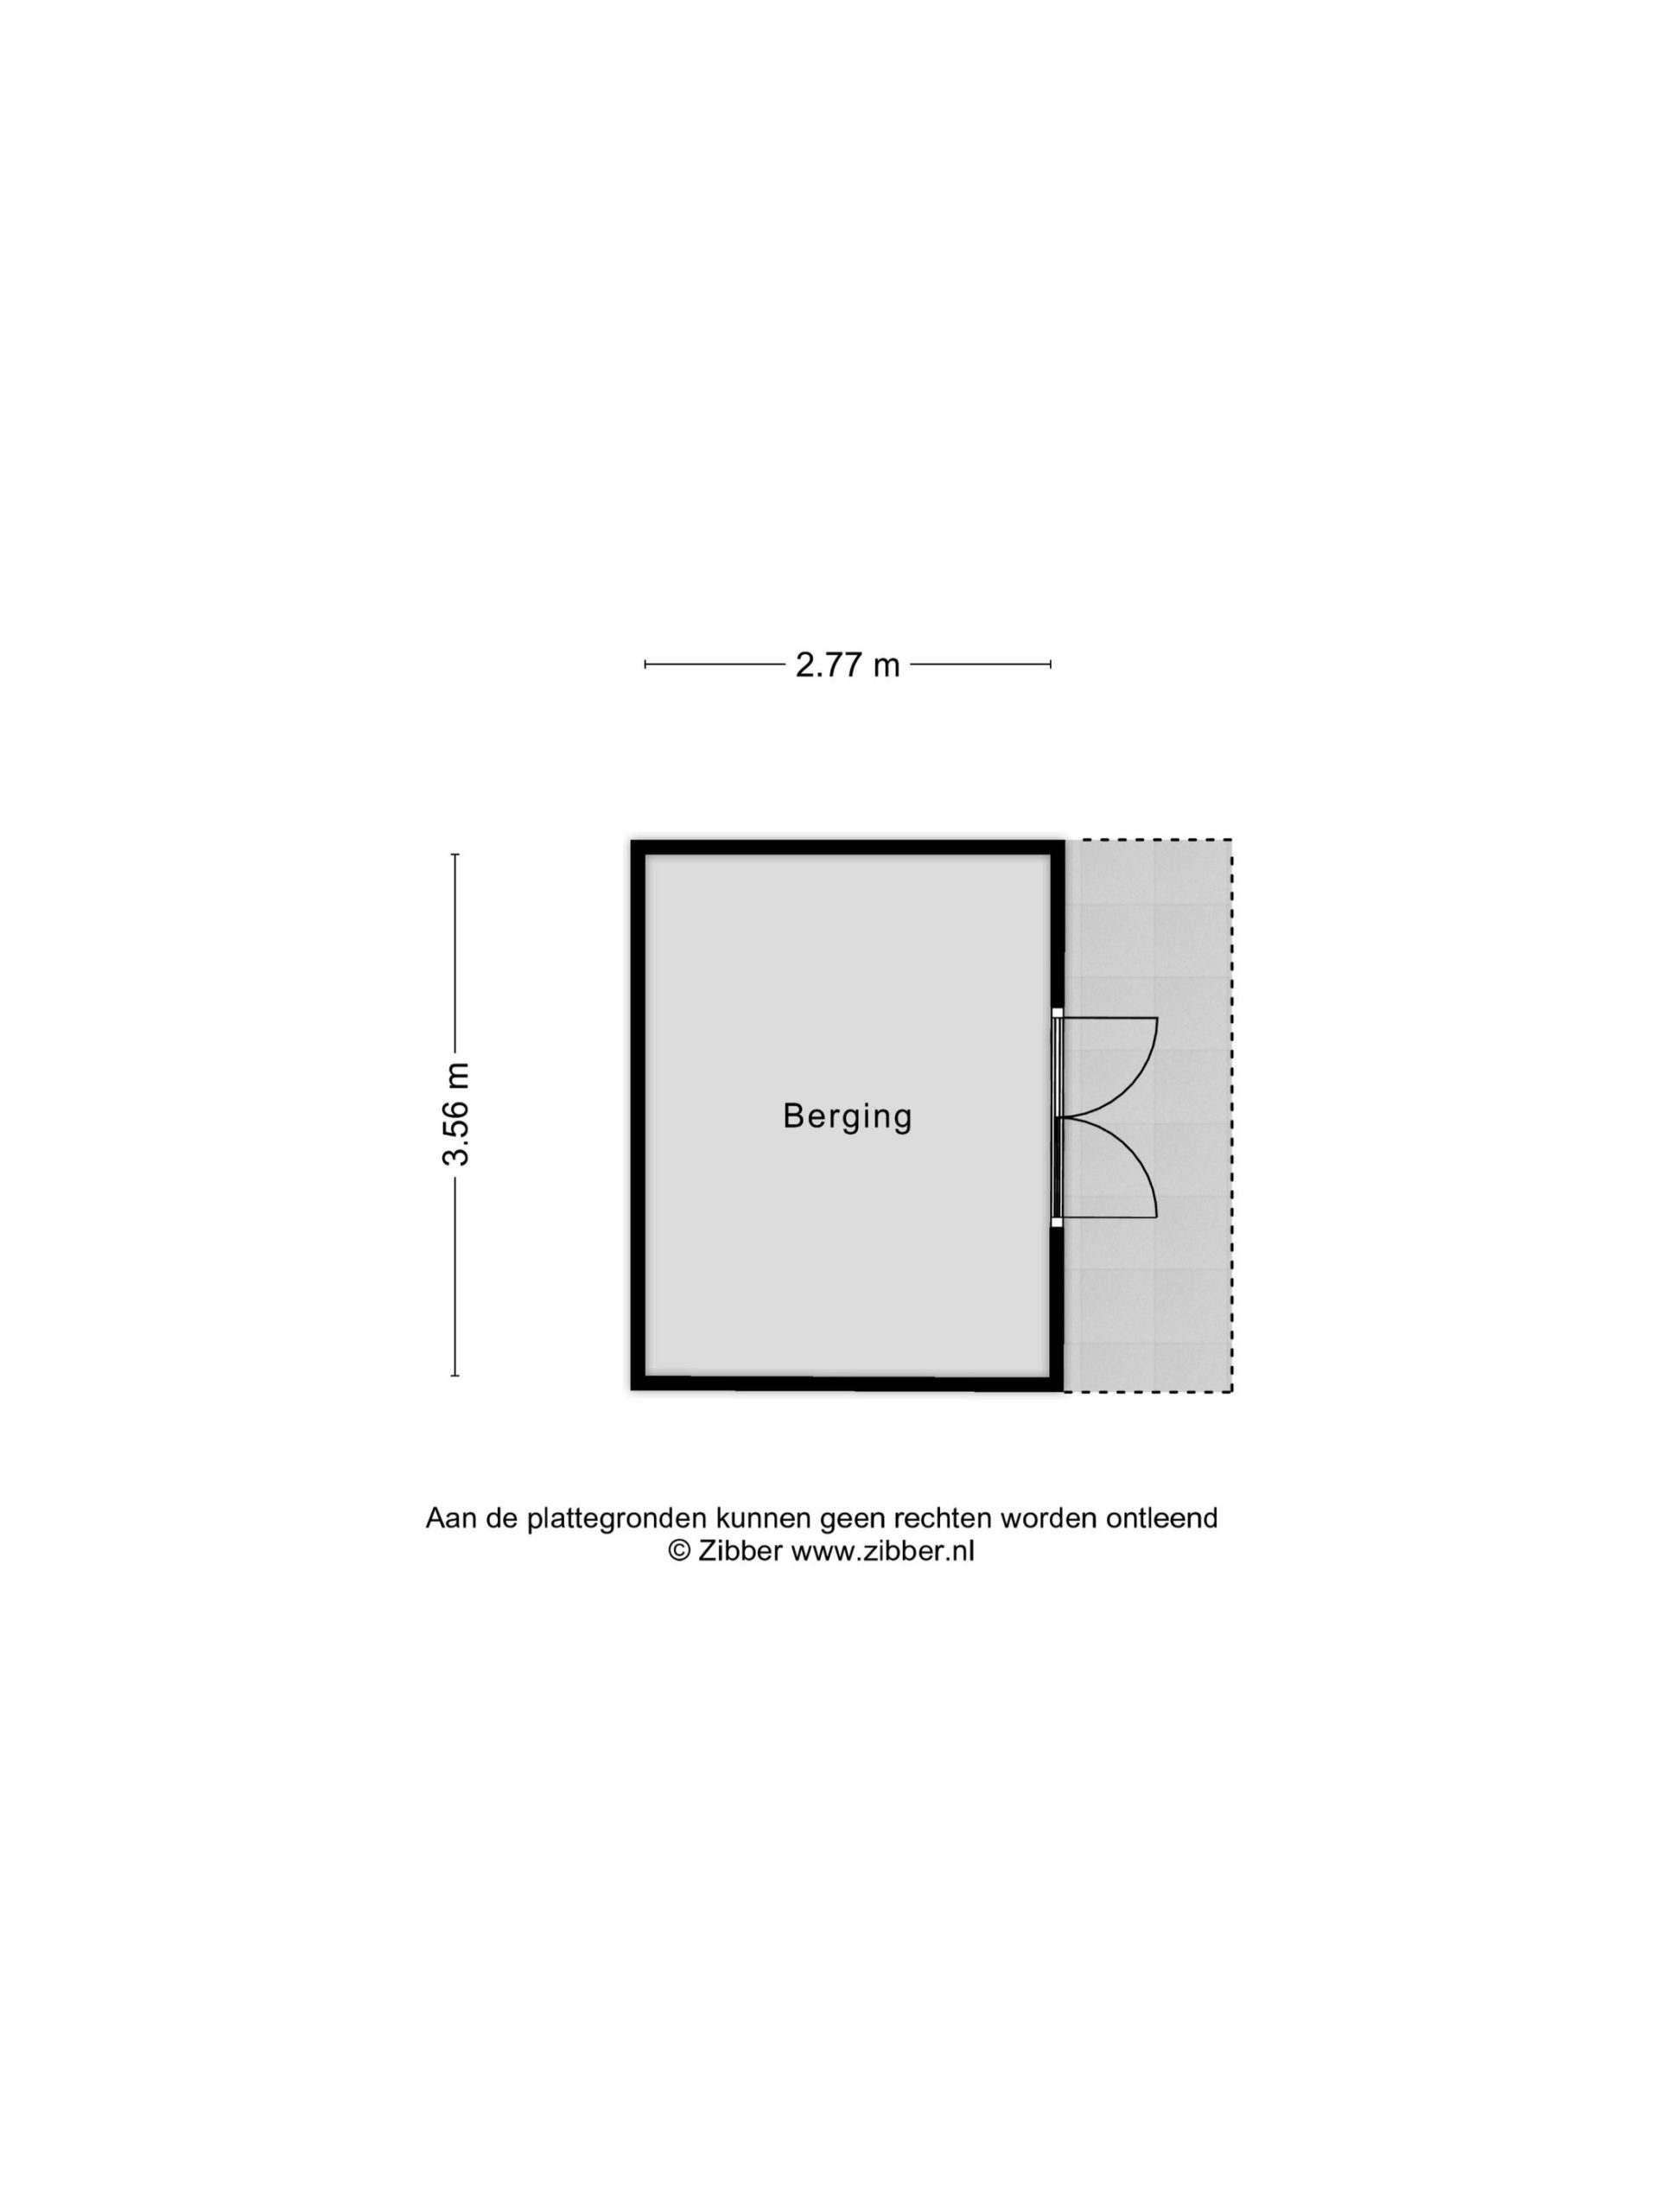 203_308409_2D_Berging_Koningshofke_2_Stein